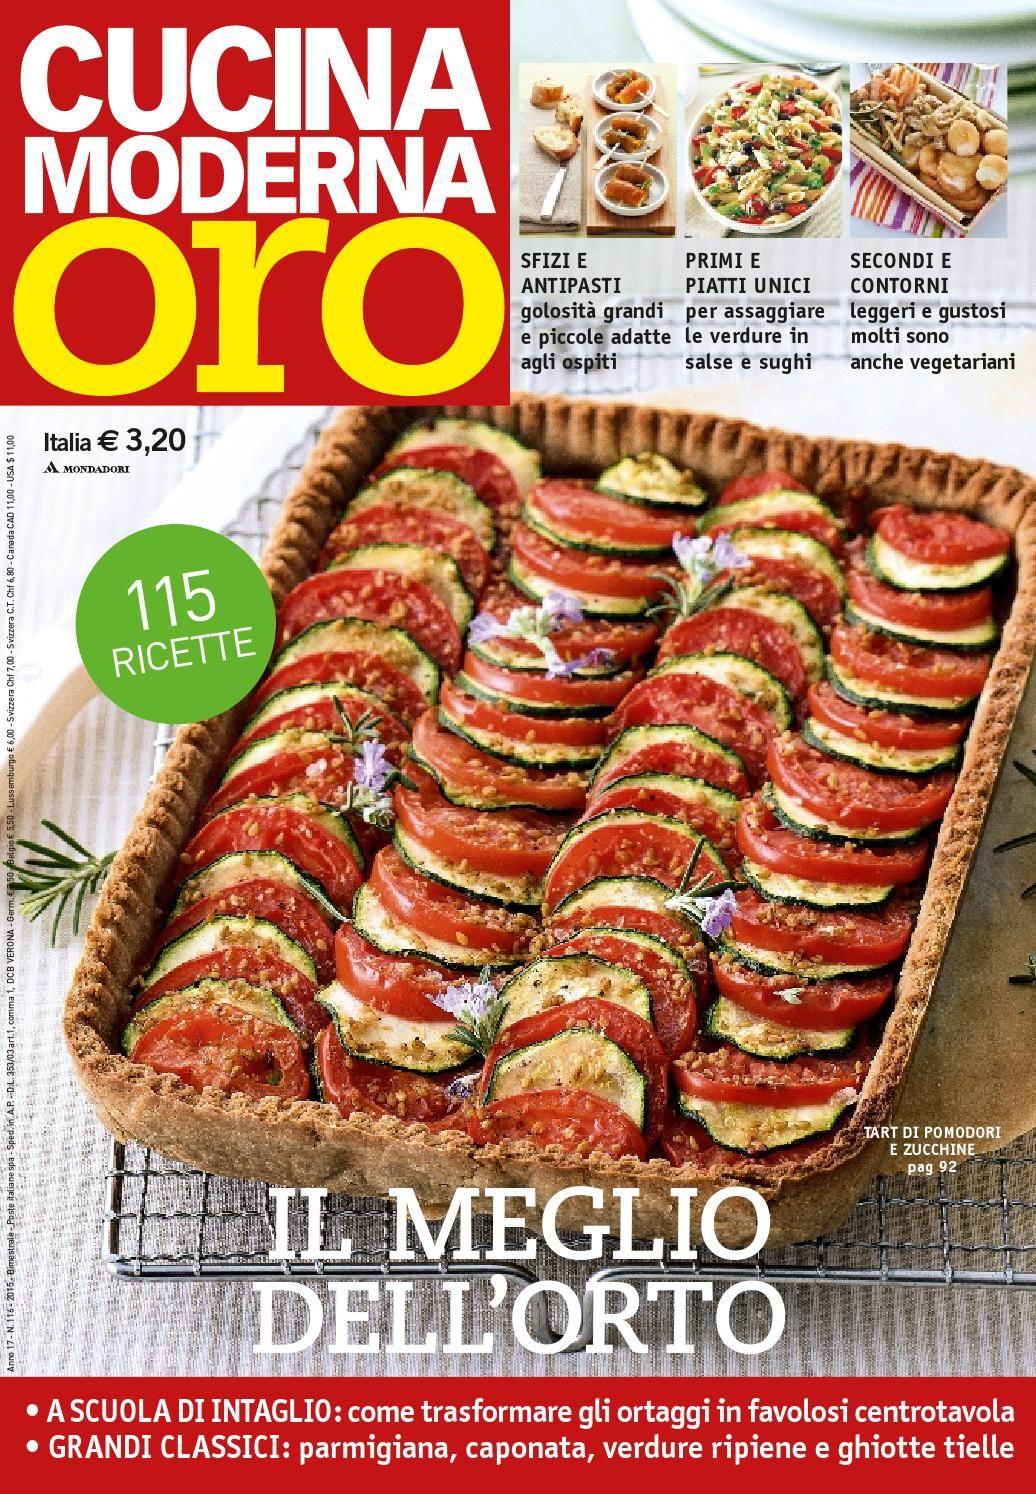 Disegno cucina moderna giugno 2015 : Cucina moderna oro 11 06 2015 by m@r | Cucina, Celiac and Food